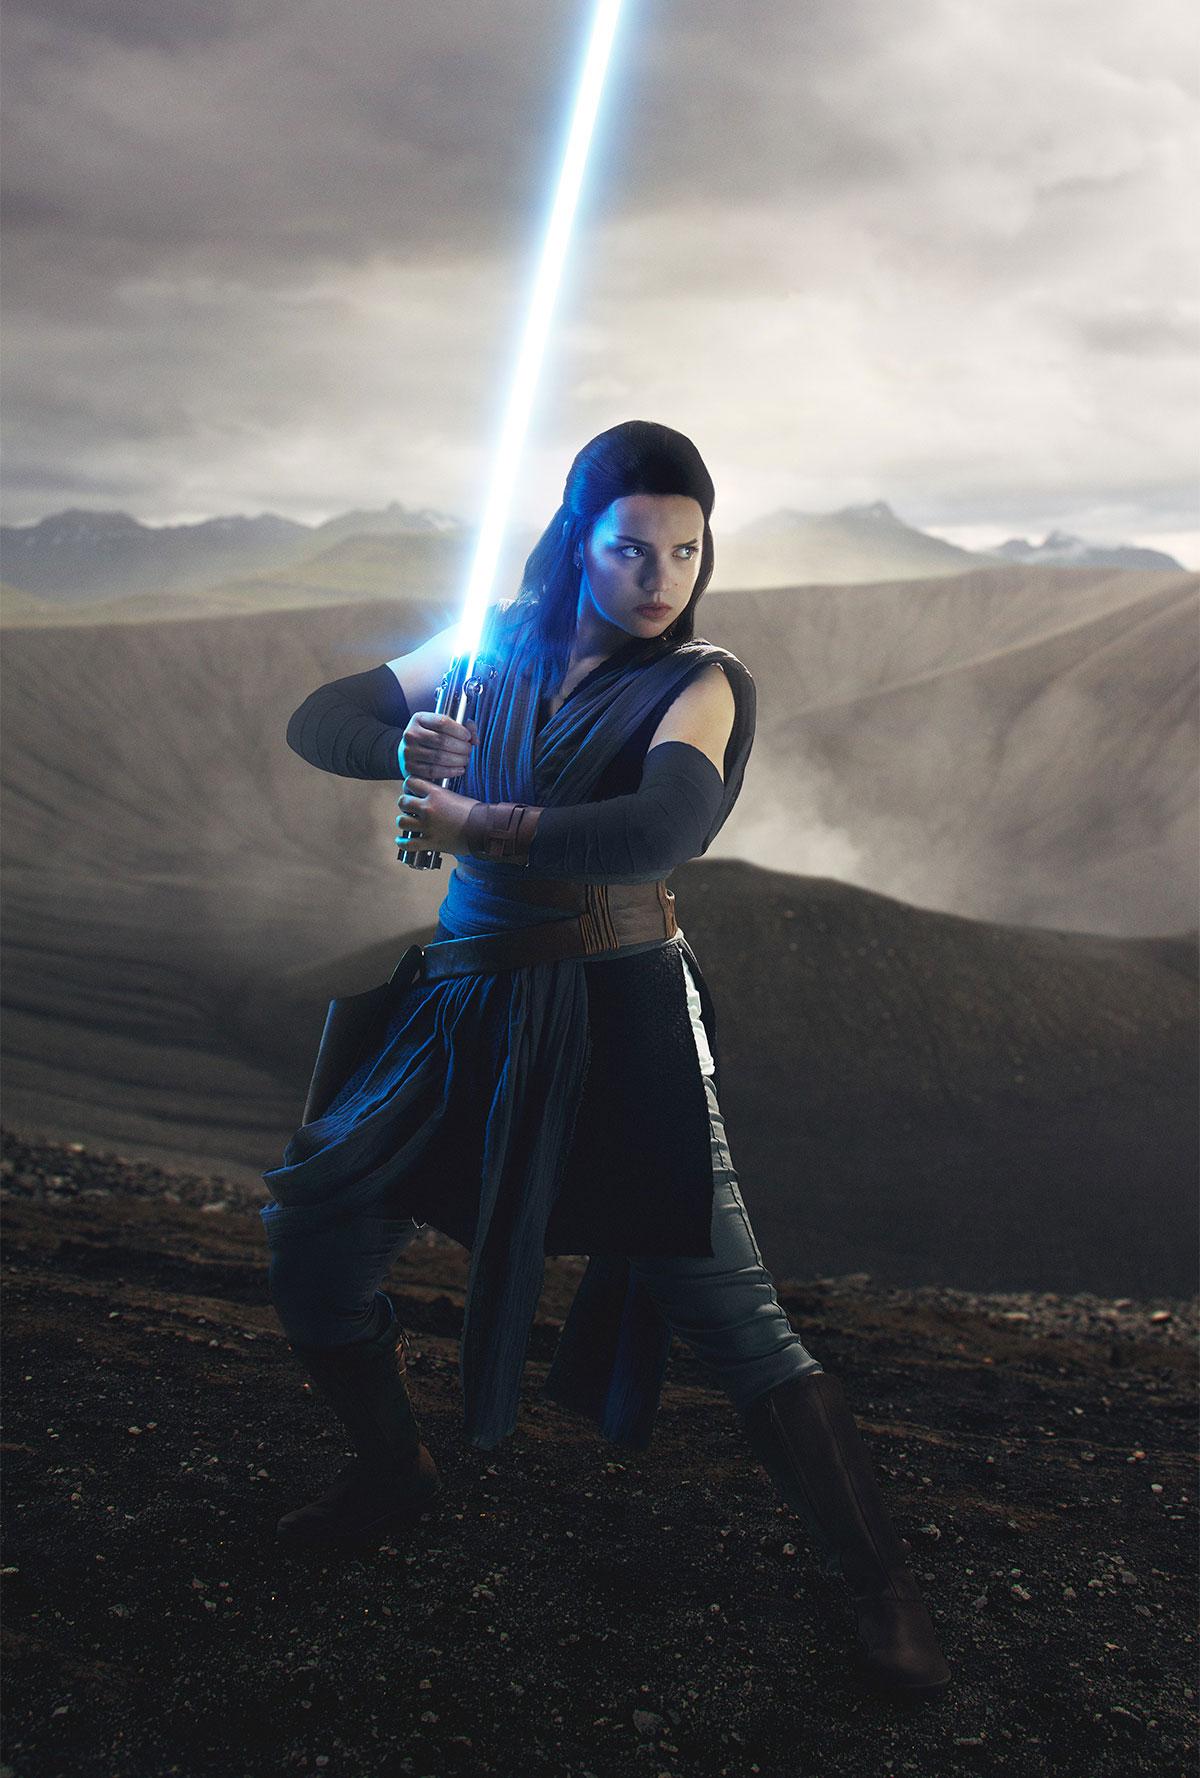 Arthur Sayanoff Rey Star Wars 11 10